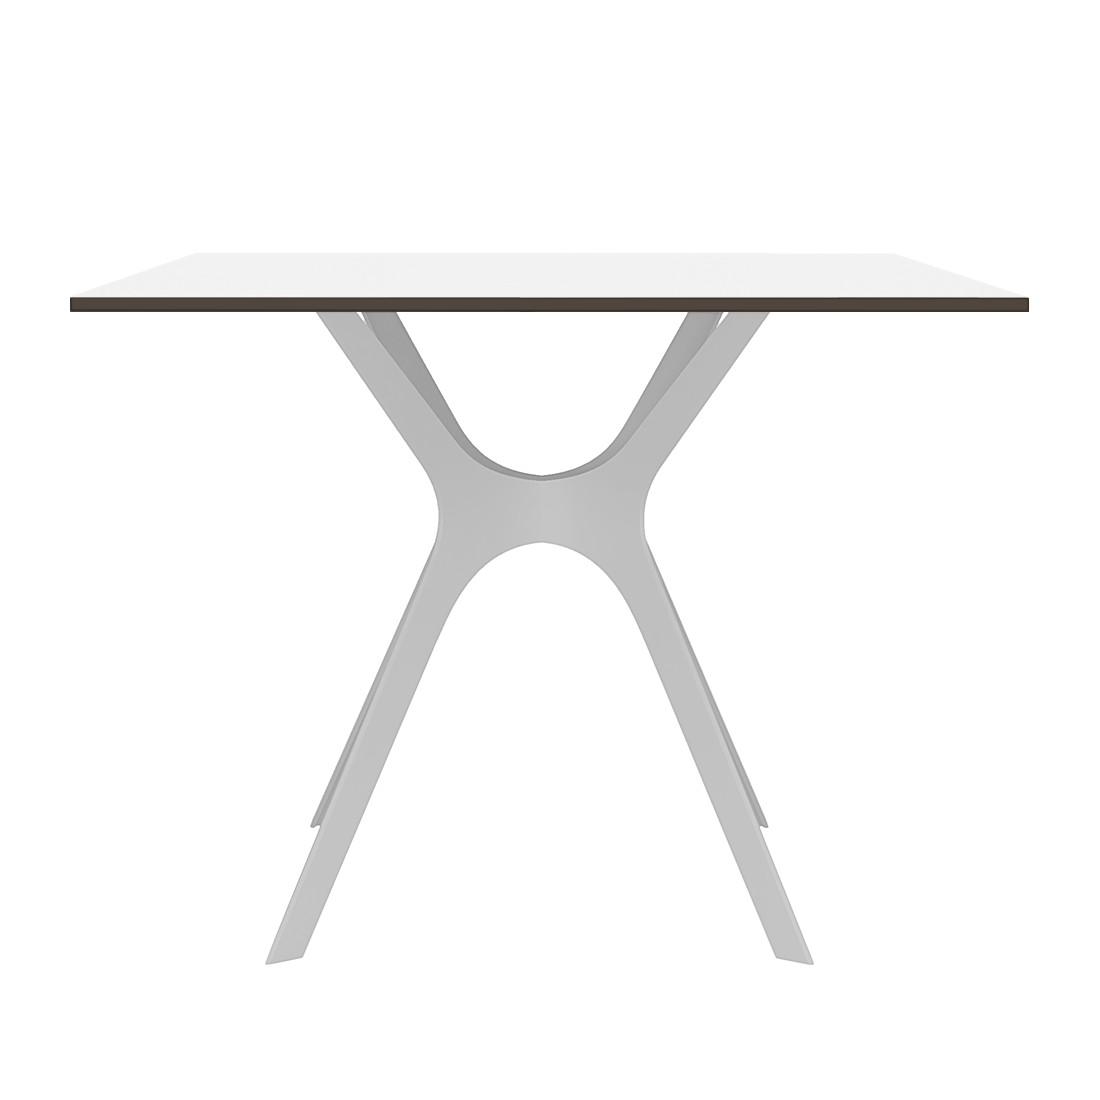 Home 24 - Table à manger vela ii - blanc - 70 x 70 cm, loftscape